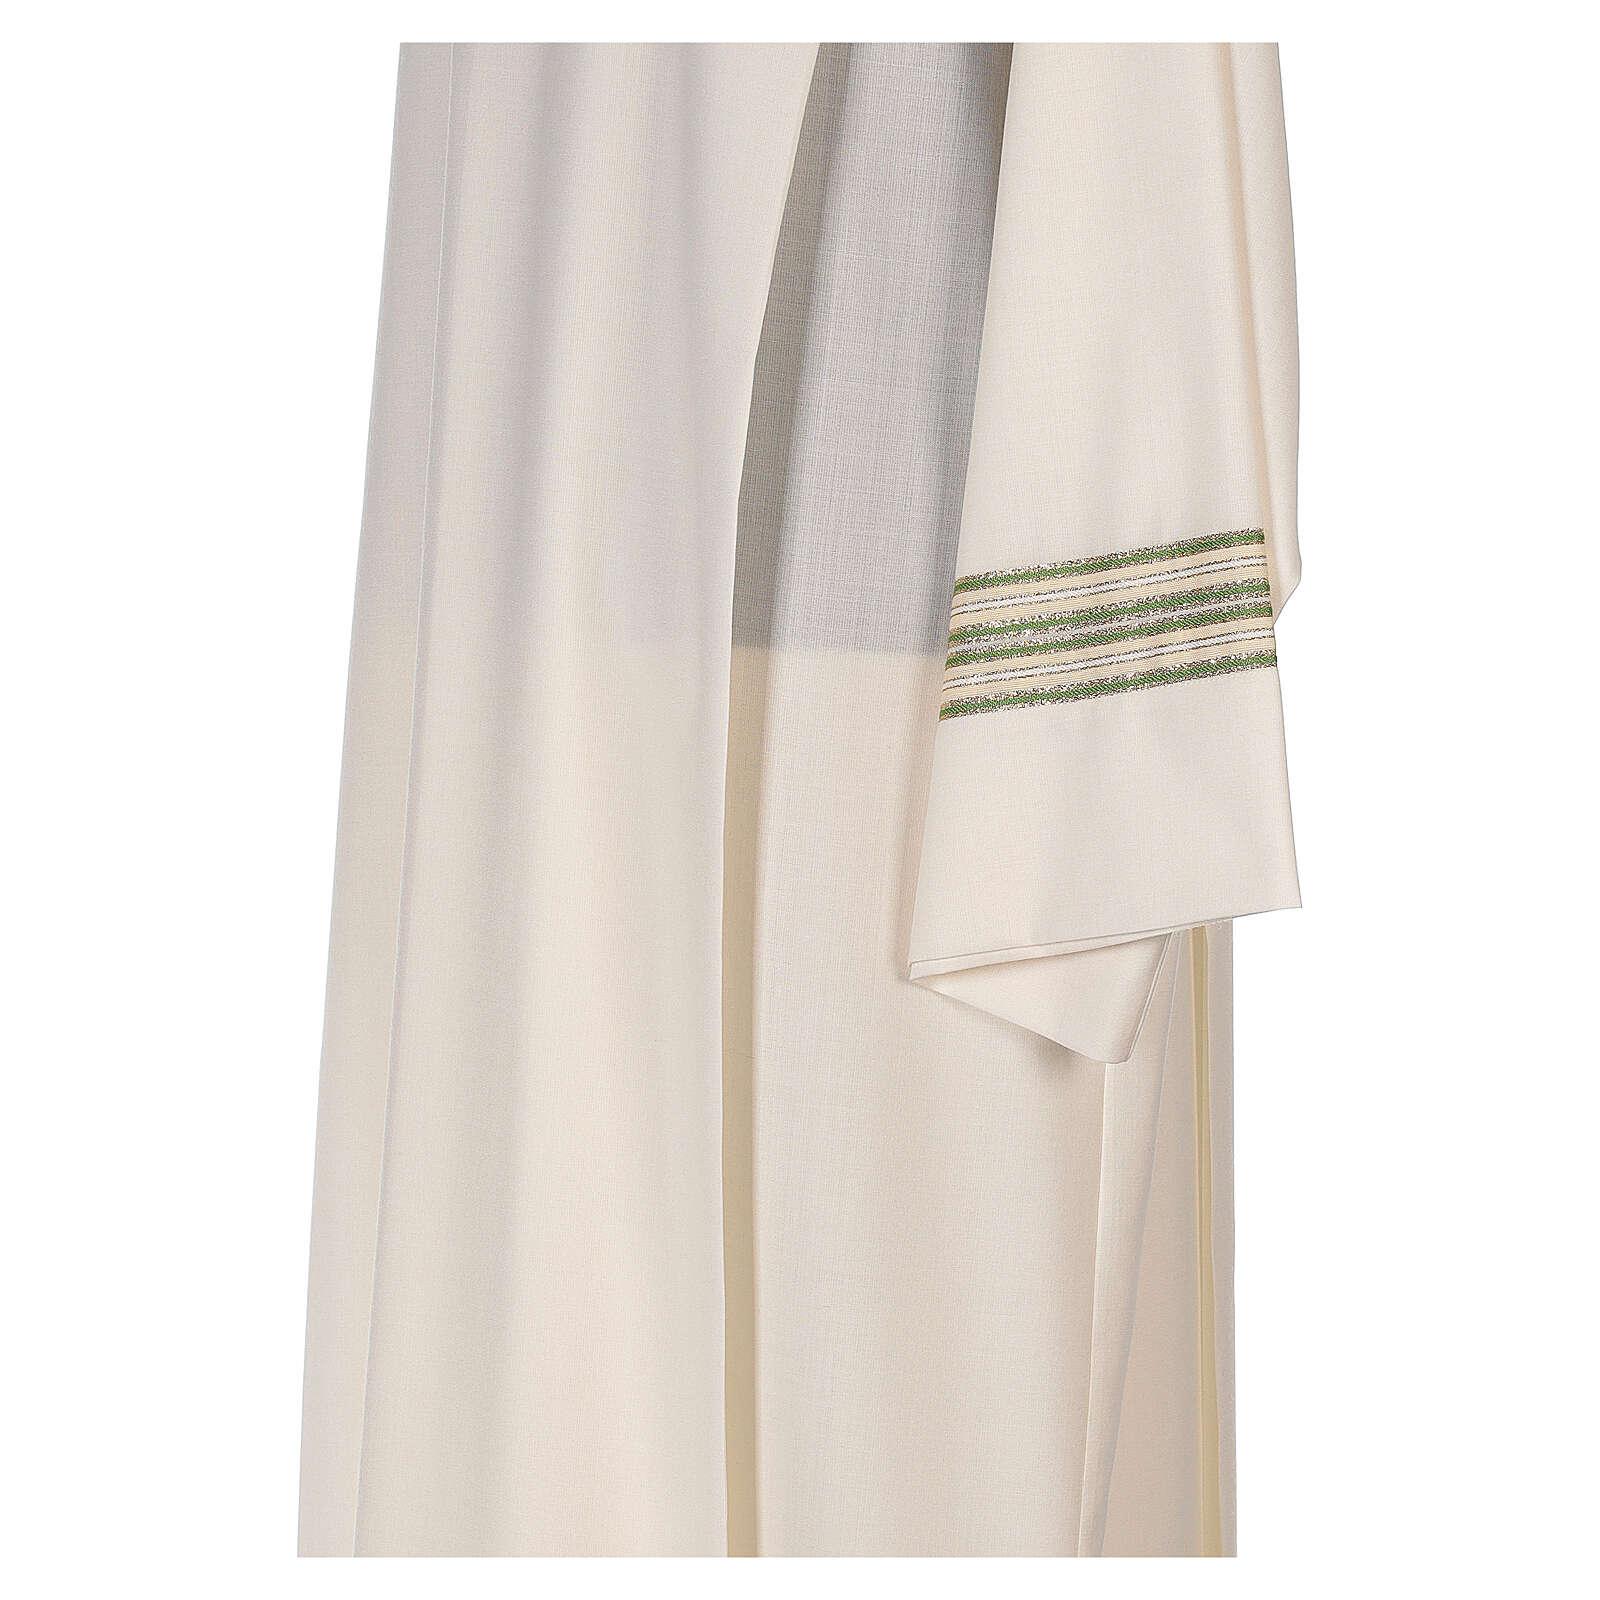 Aube 55% polyester 45% laine rayures or vert 4